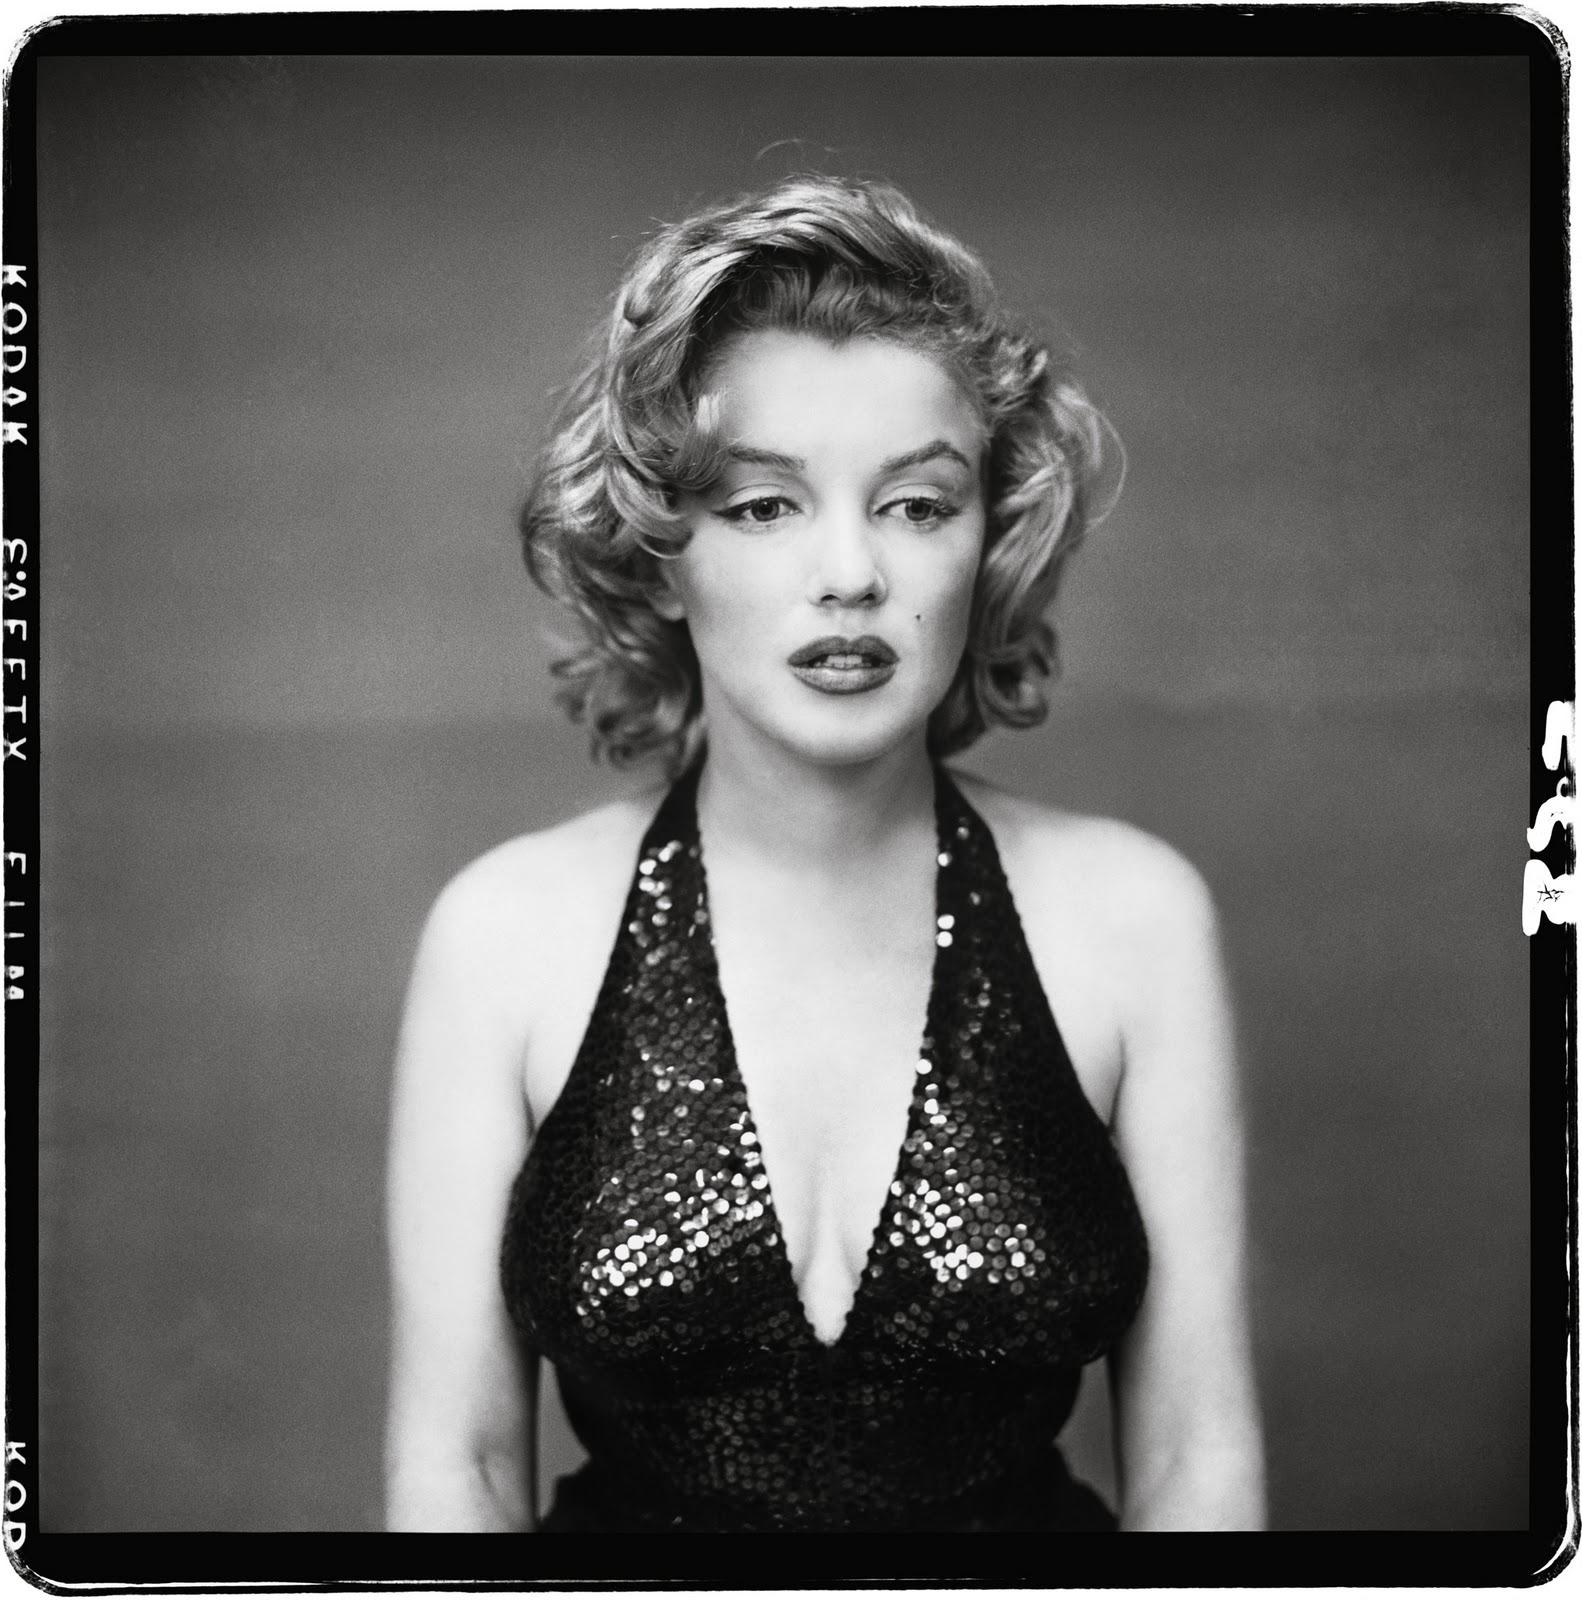 http://1.bp.blogspot.com/_OAh4Xl94vrU/TKNL3AUbIiI/AAAAAAAAYGI/fz10q3sjXiI/s1600/Marilyn+Monroe,+actor,+New+York,+May+6,+1957.jpg